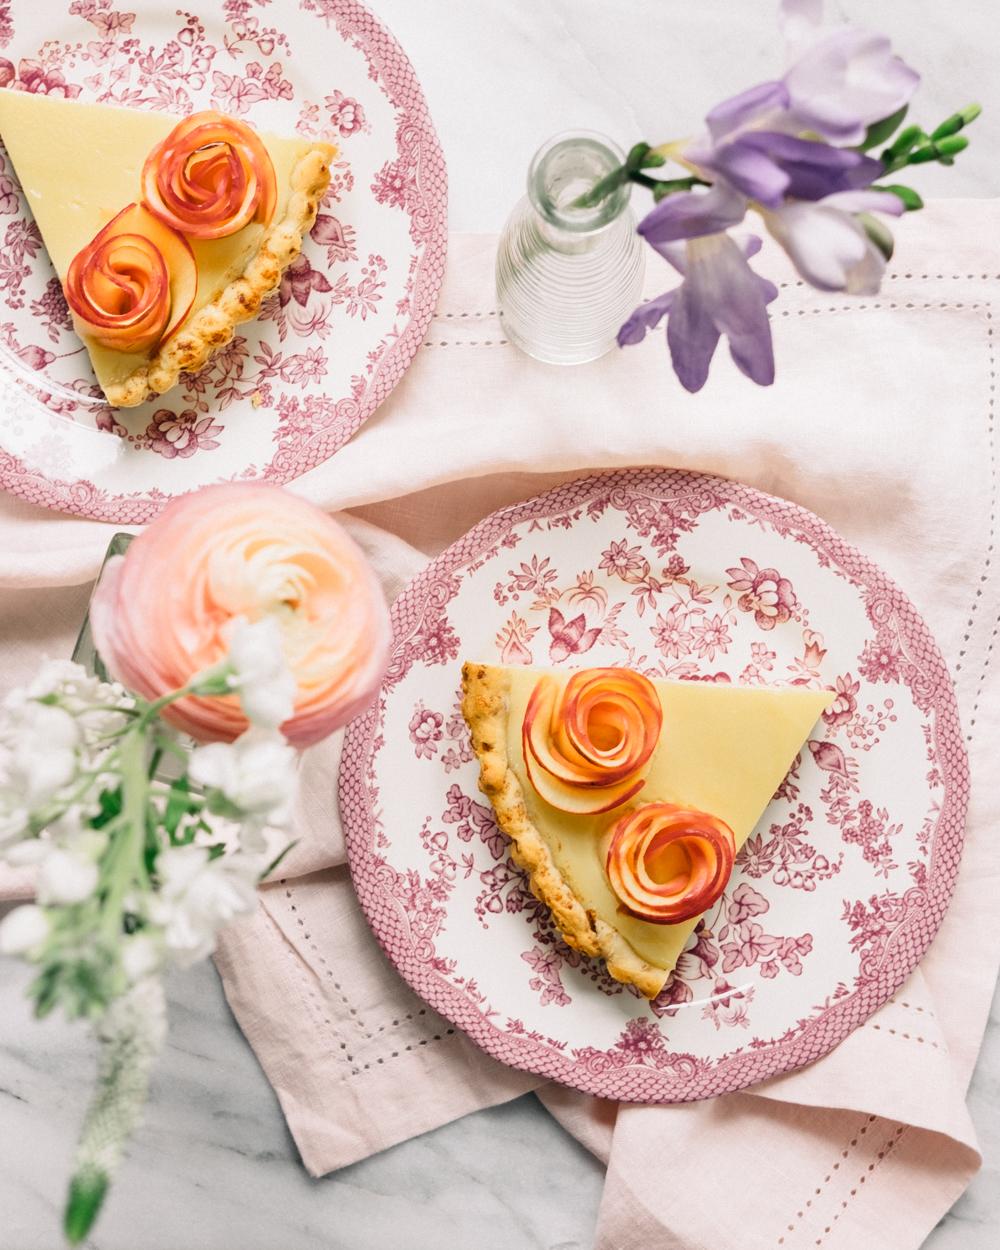 bd9f9-sabrina-stavenjord-my-miaou-apple-rose-maple-tart-recipe.jpg